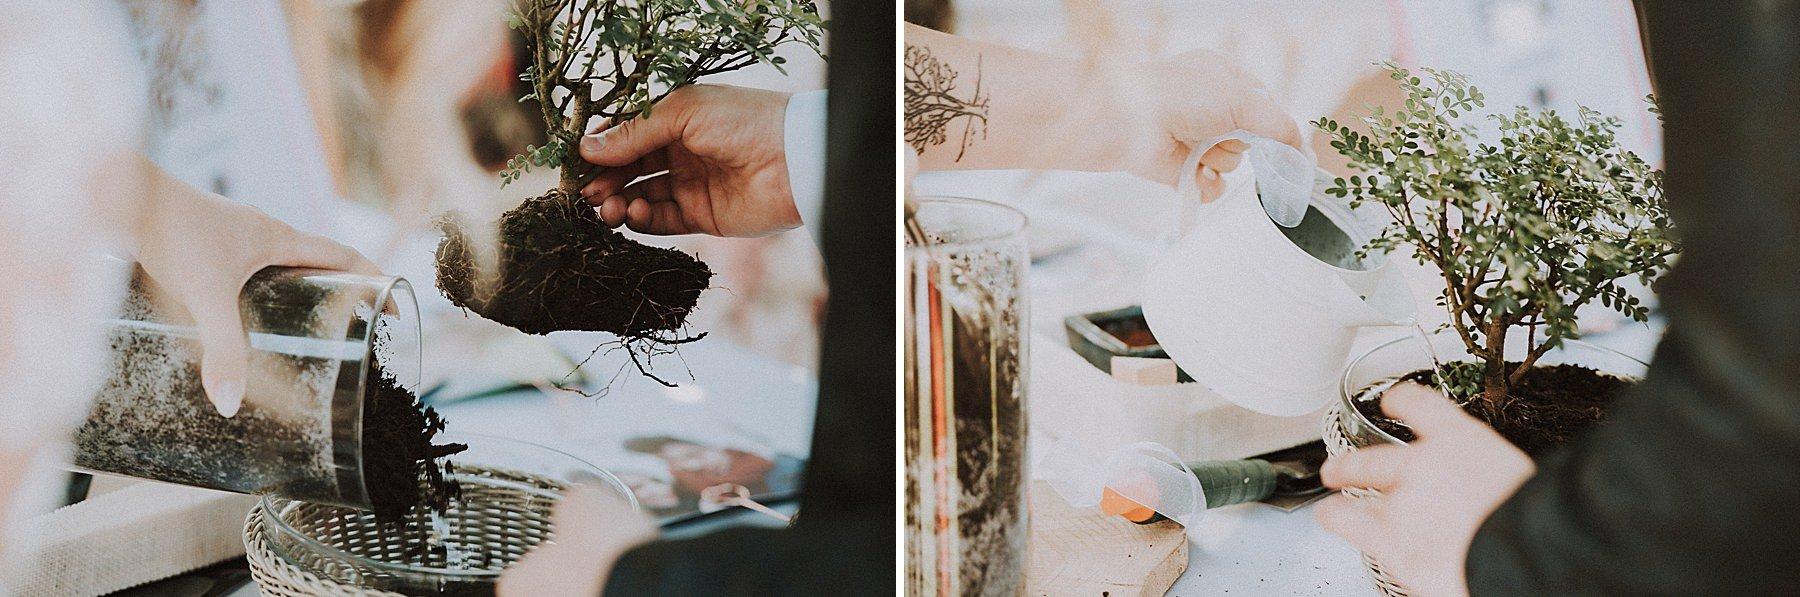 sposi piantano bonsai